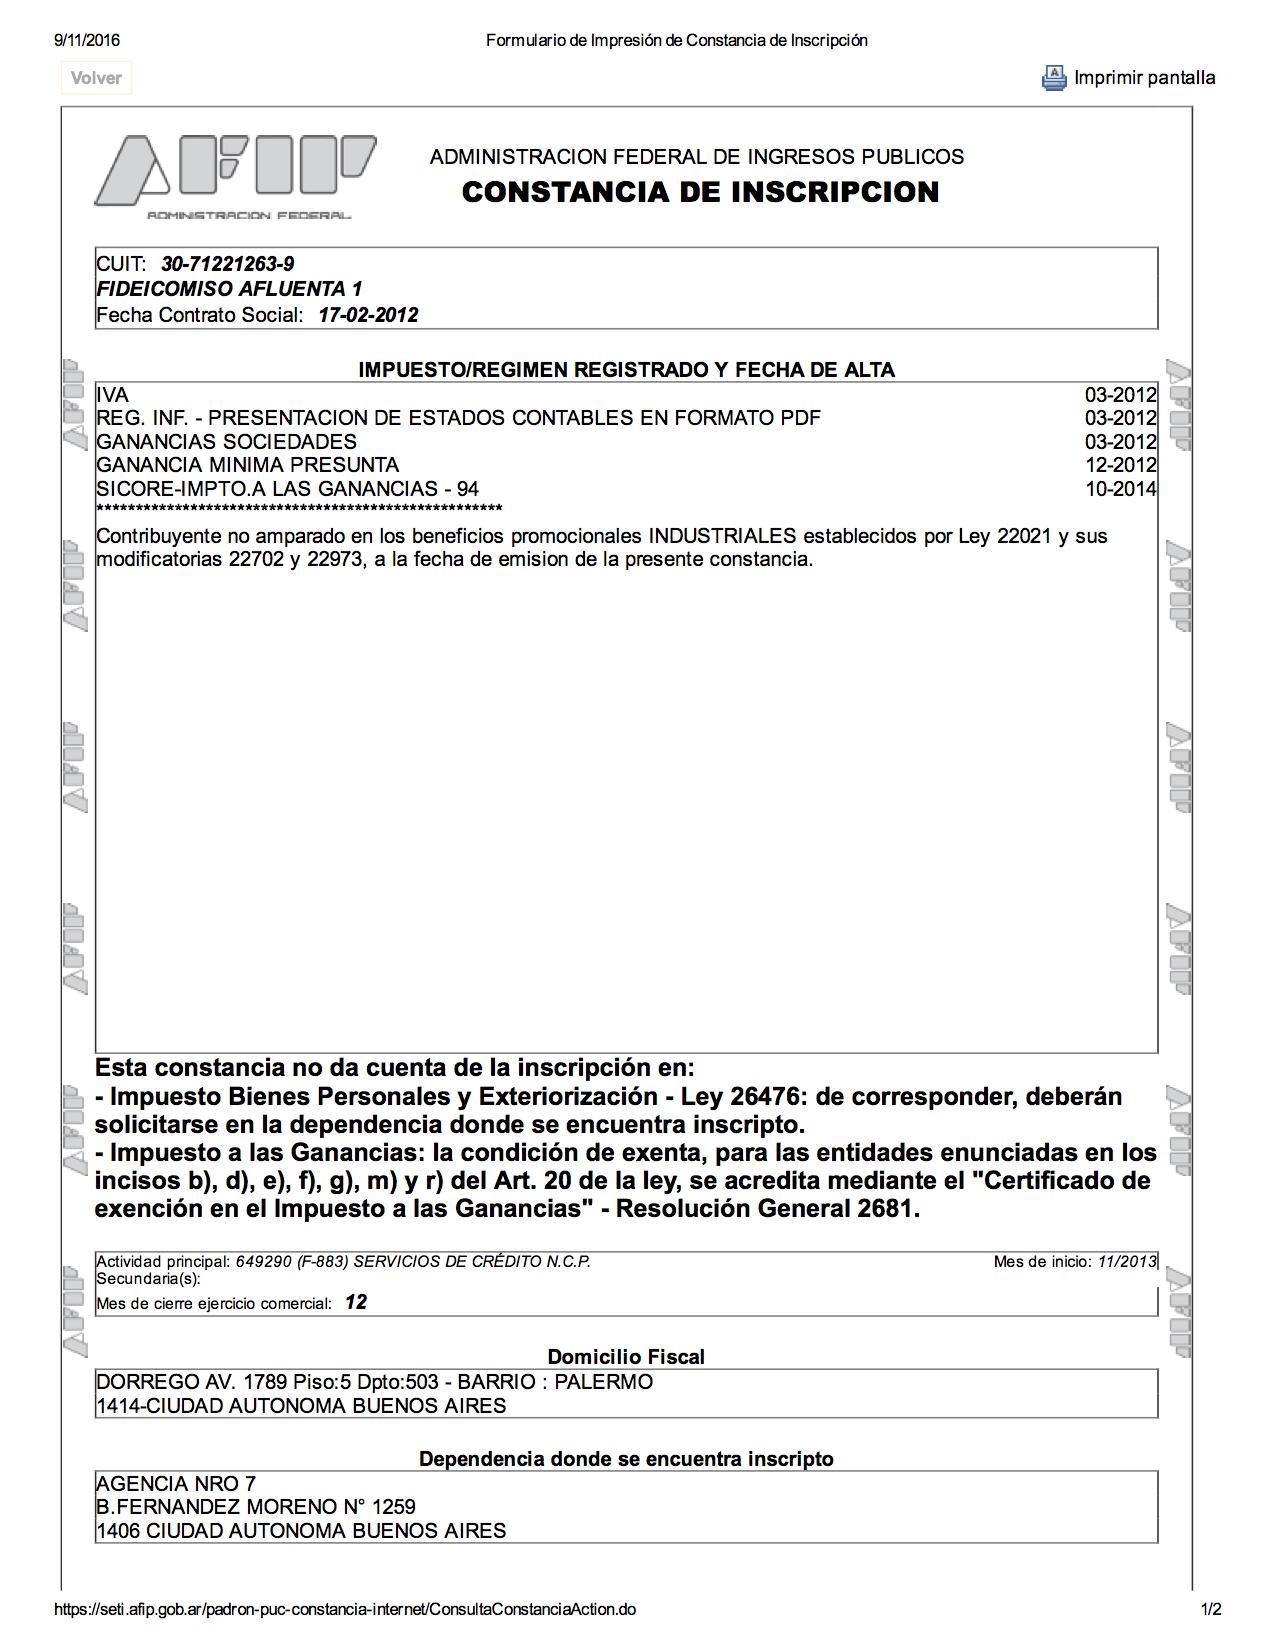 Inscripciones legales afluenta argentina for Inscripcion ingresos brutos